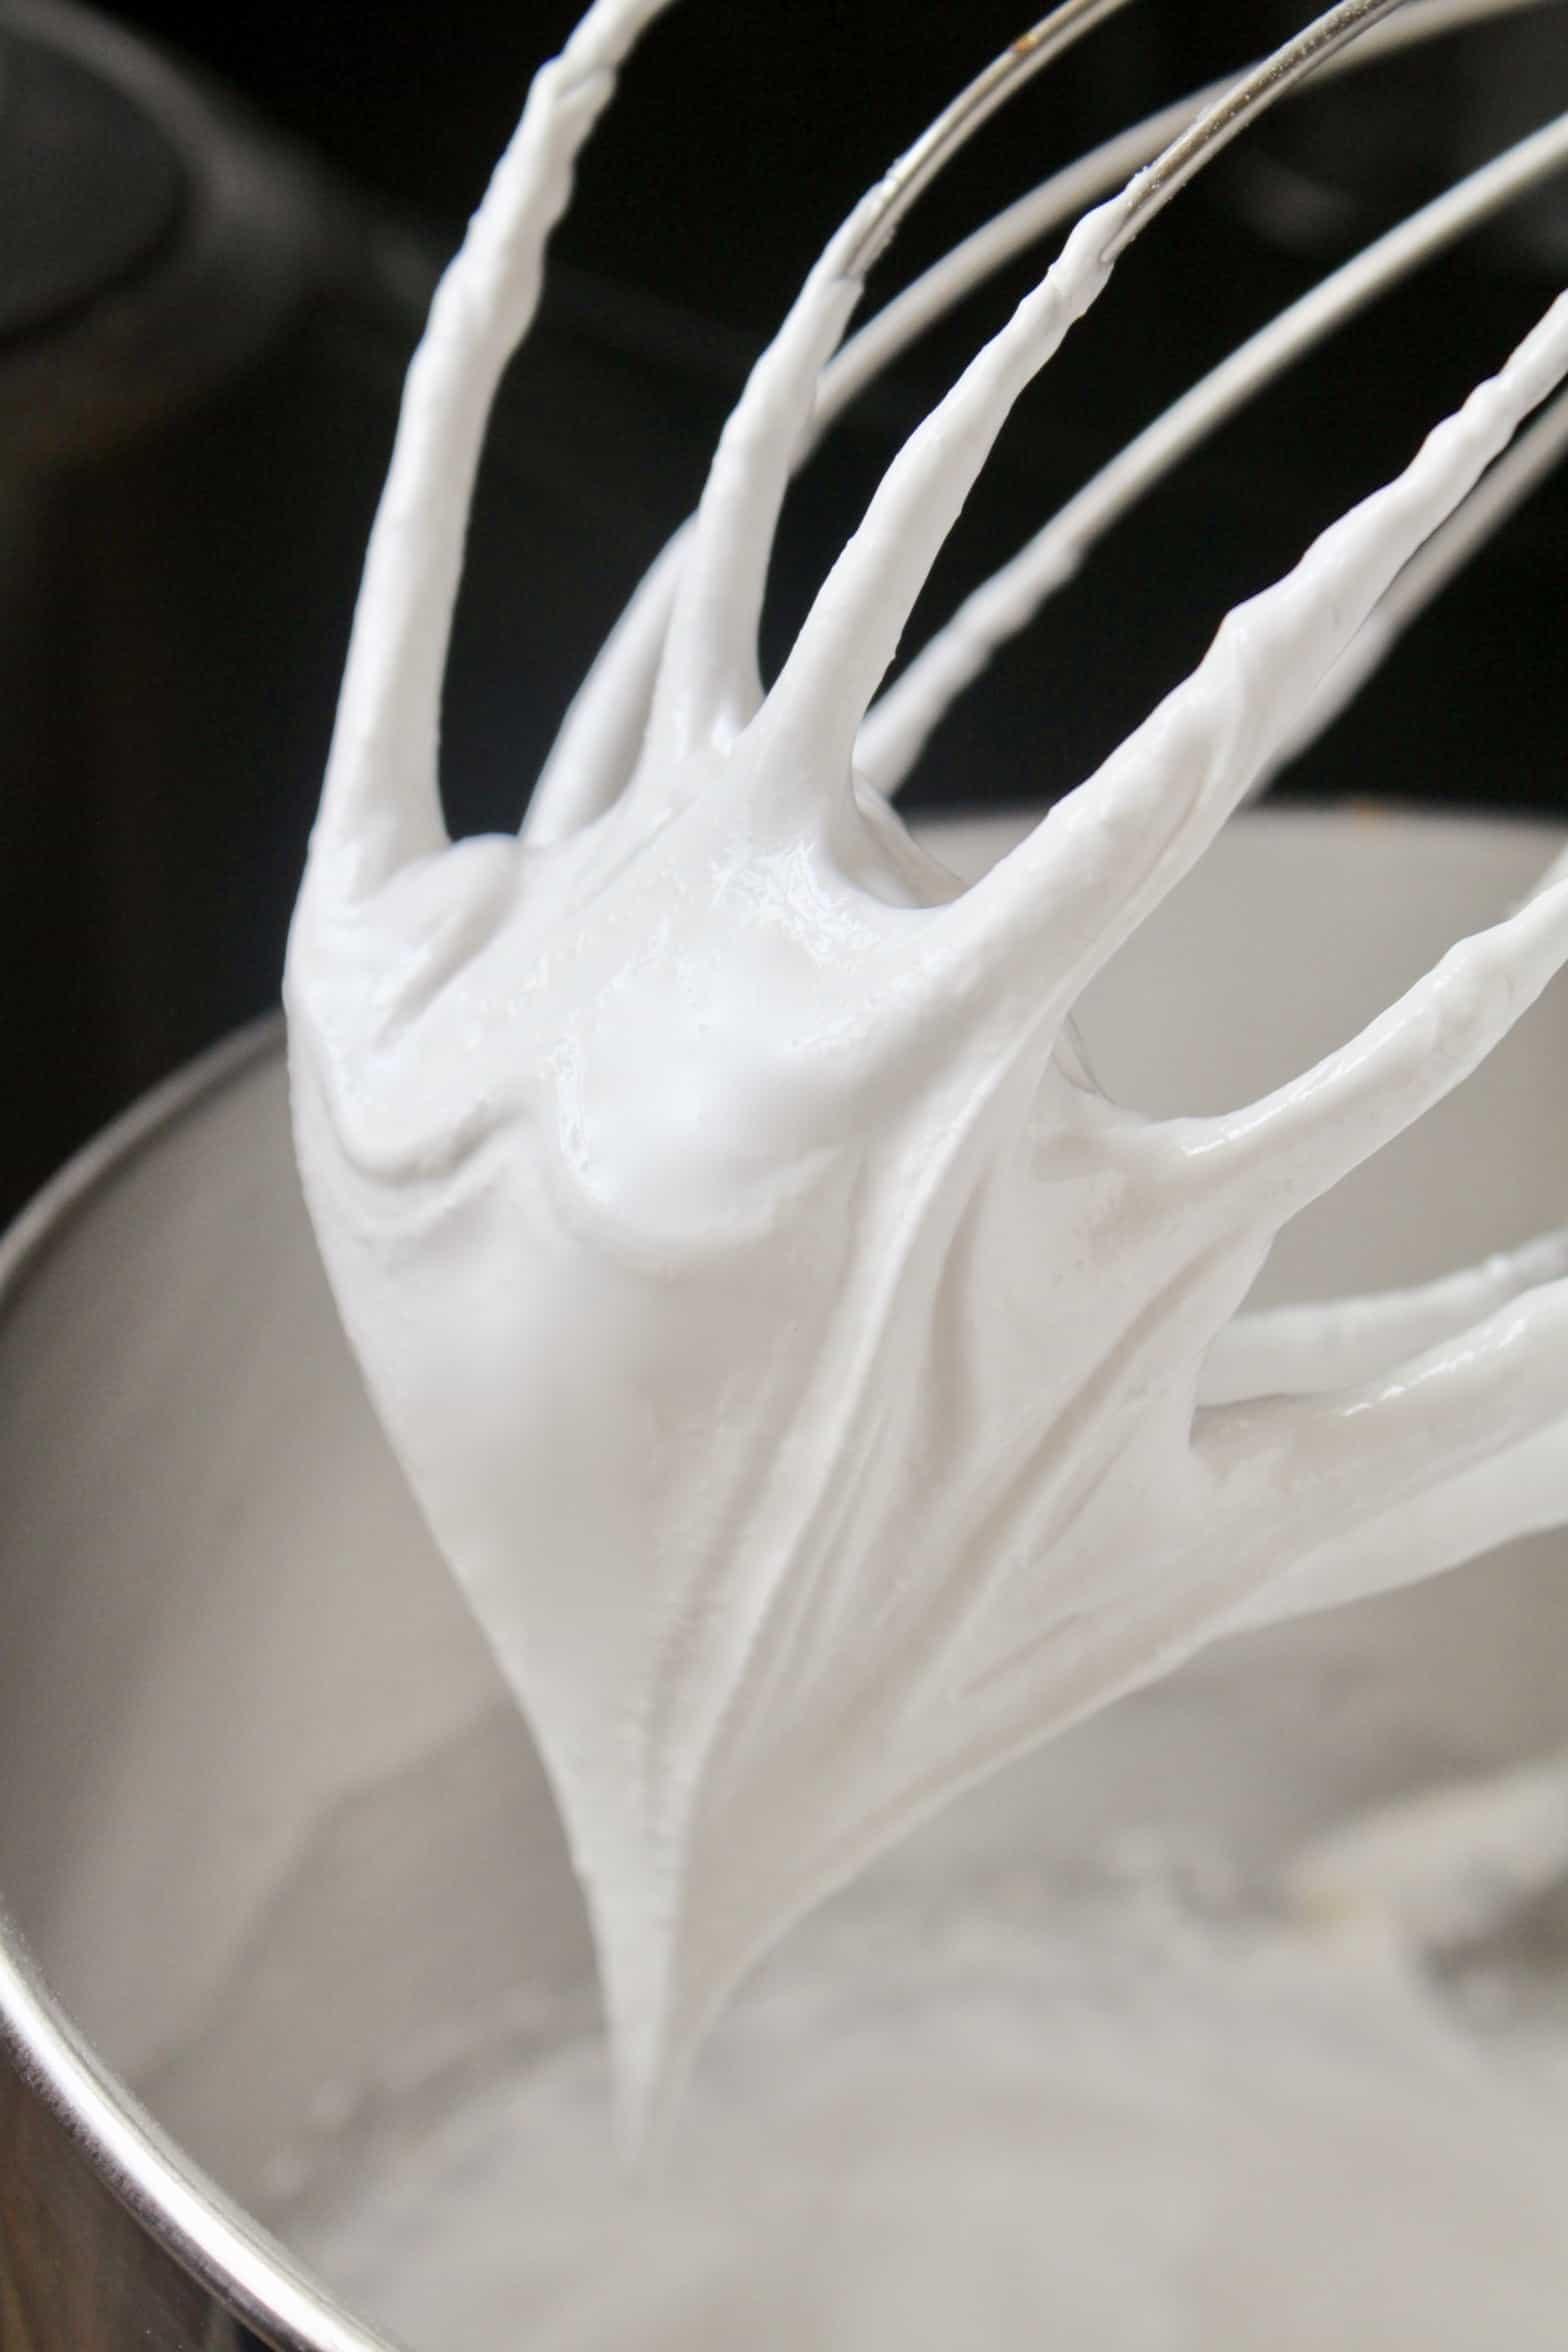 stiff glossy peaks in egg white mixture